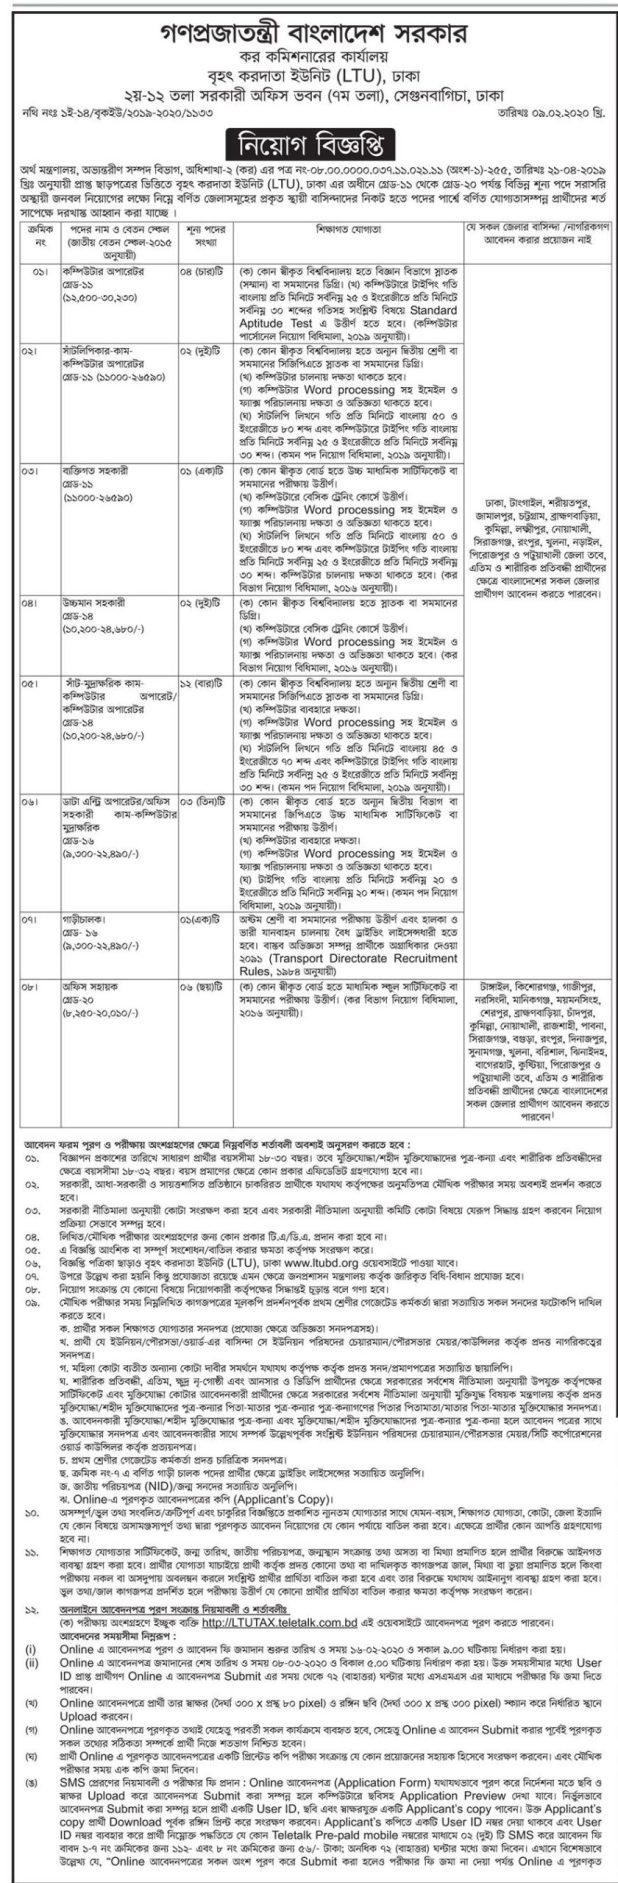 Tax commissioner office Dhaka job circular 2020